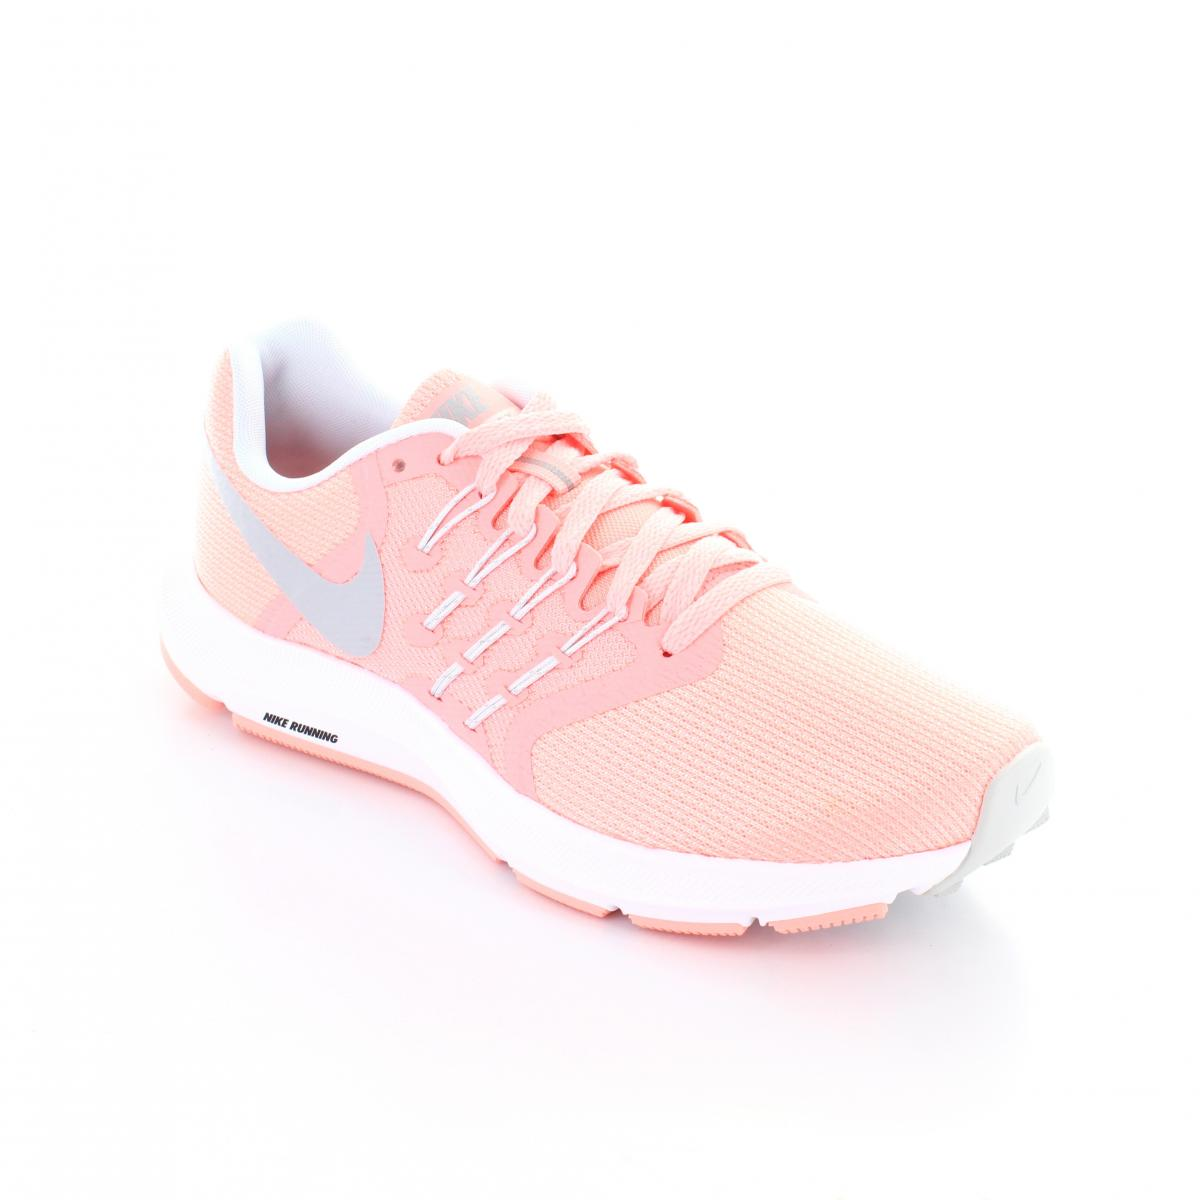 2f2b51d0 Tenis marca Nike modelo 909006-601 Color Rosa